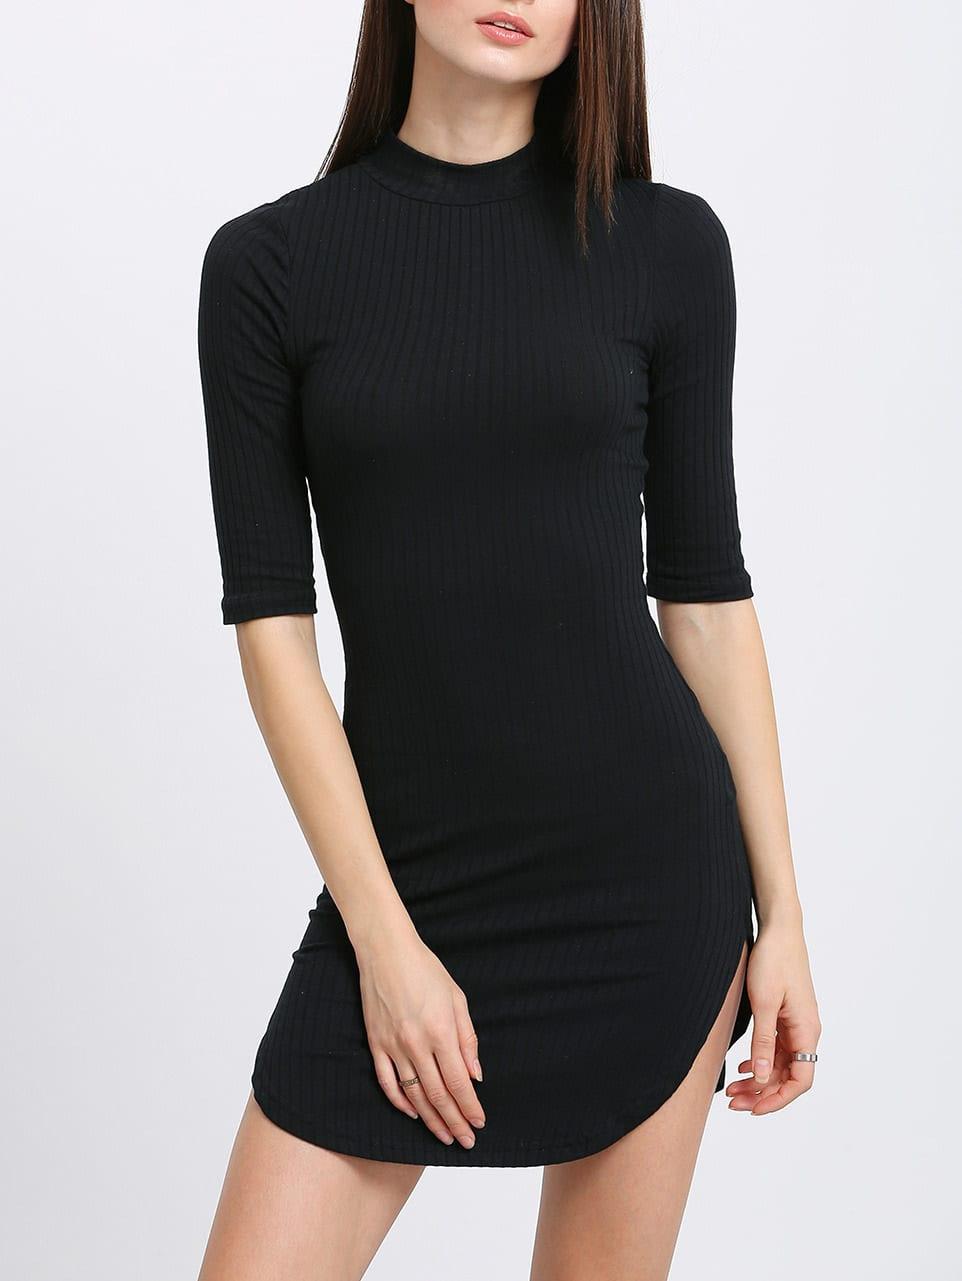 Ribbed Knit Slim Dolphin Hem Dress dress160315703